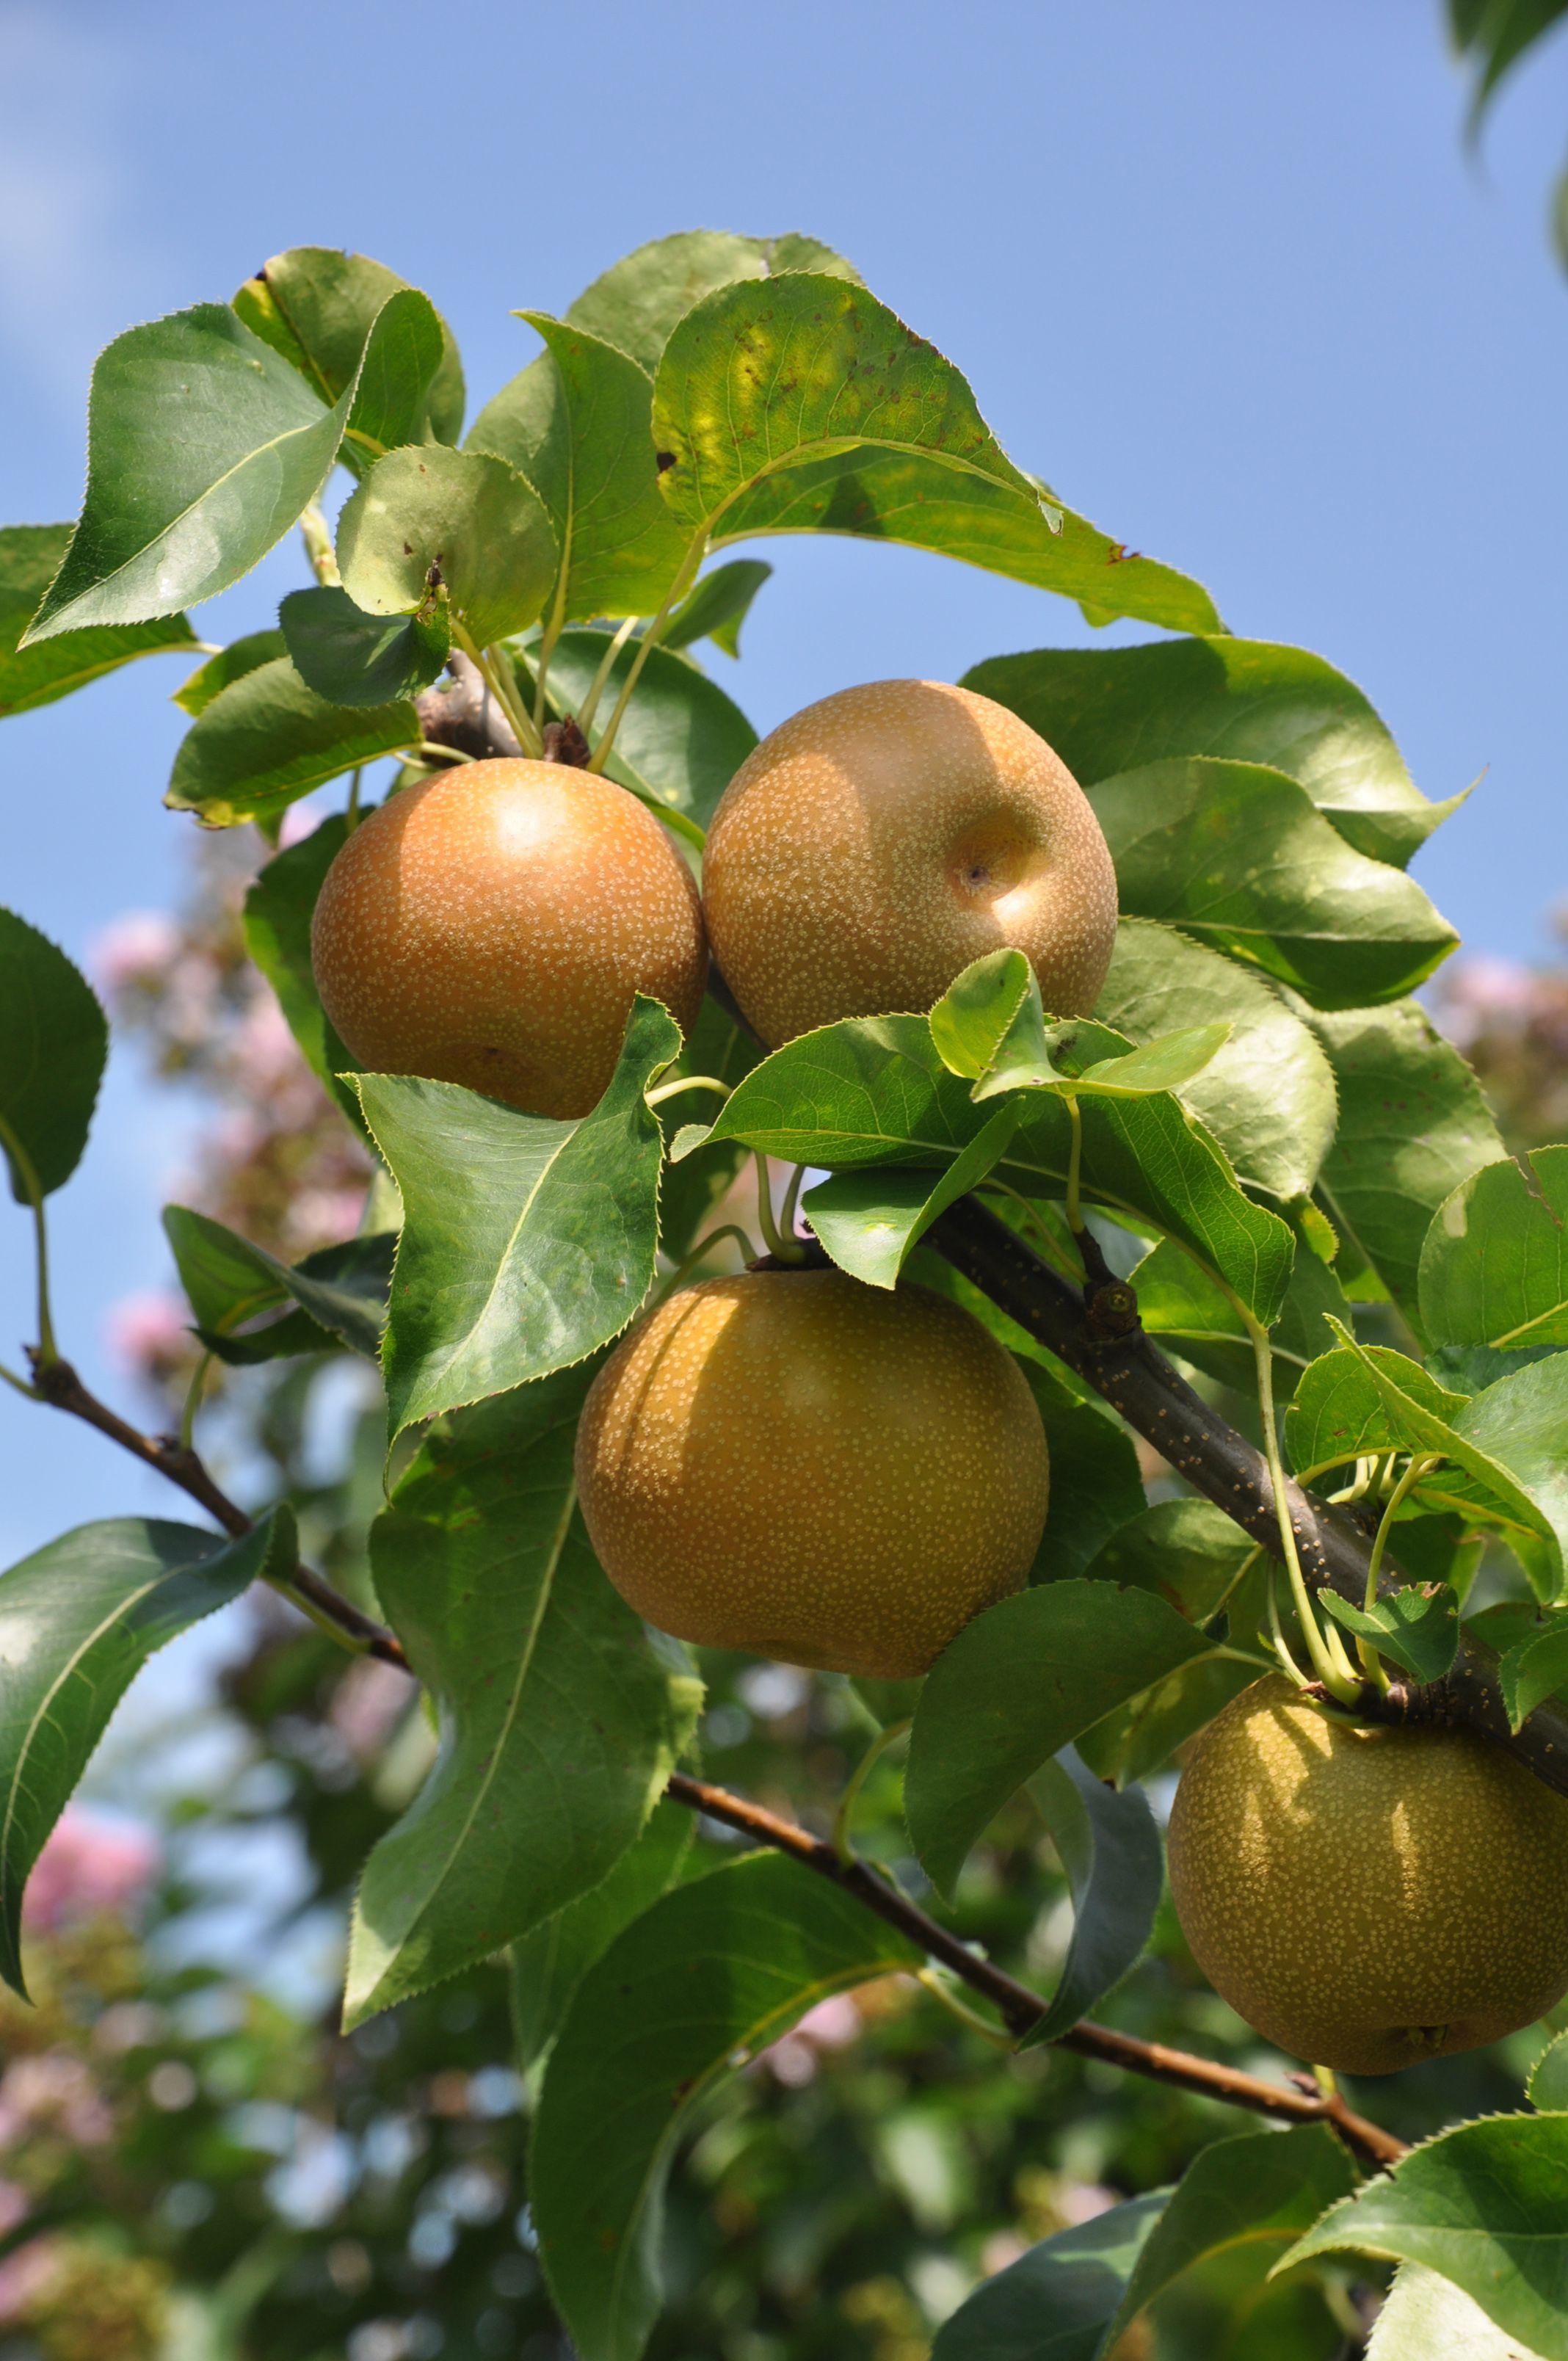 Shinko Asian Pears On Tree